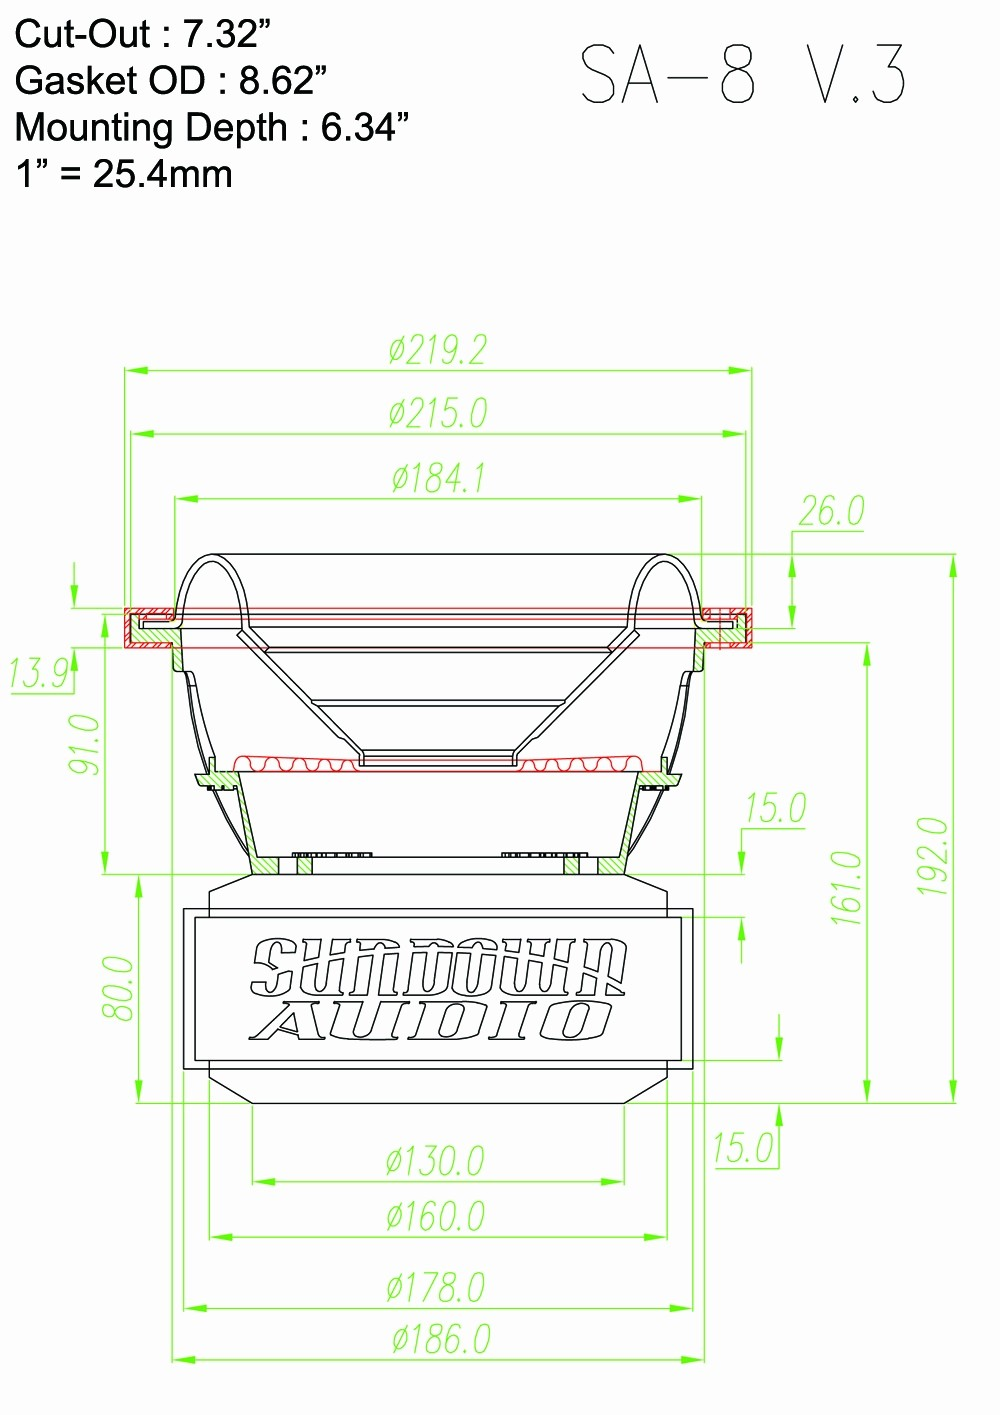 Kicker Wiring Diagram Image Svc Alpine Type Inch Subwoofer Diagrams Ohm Mono Dvc Kisl